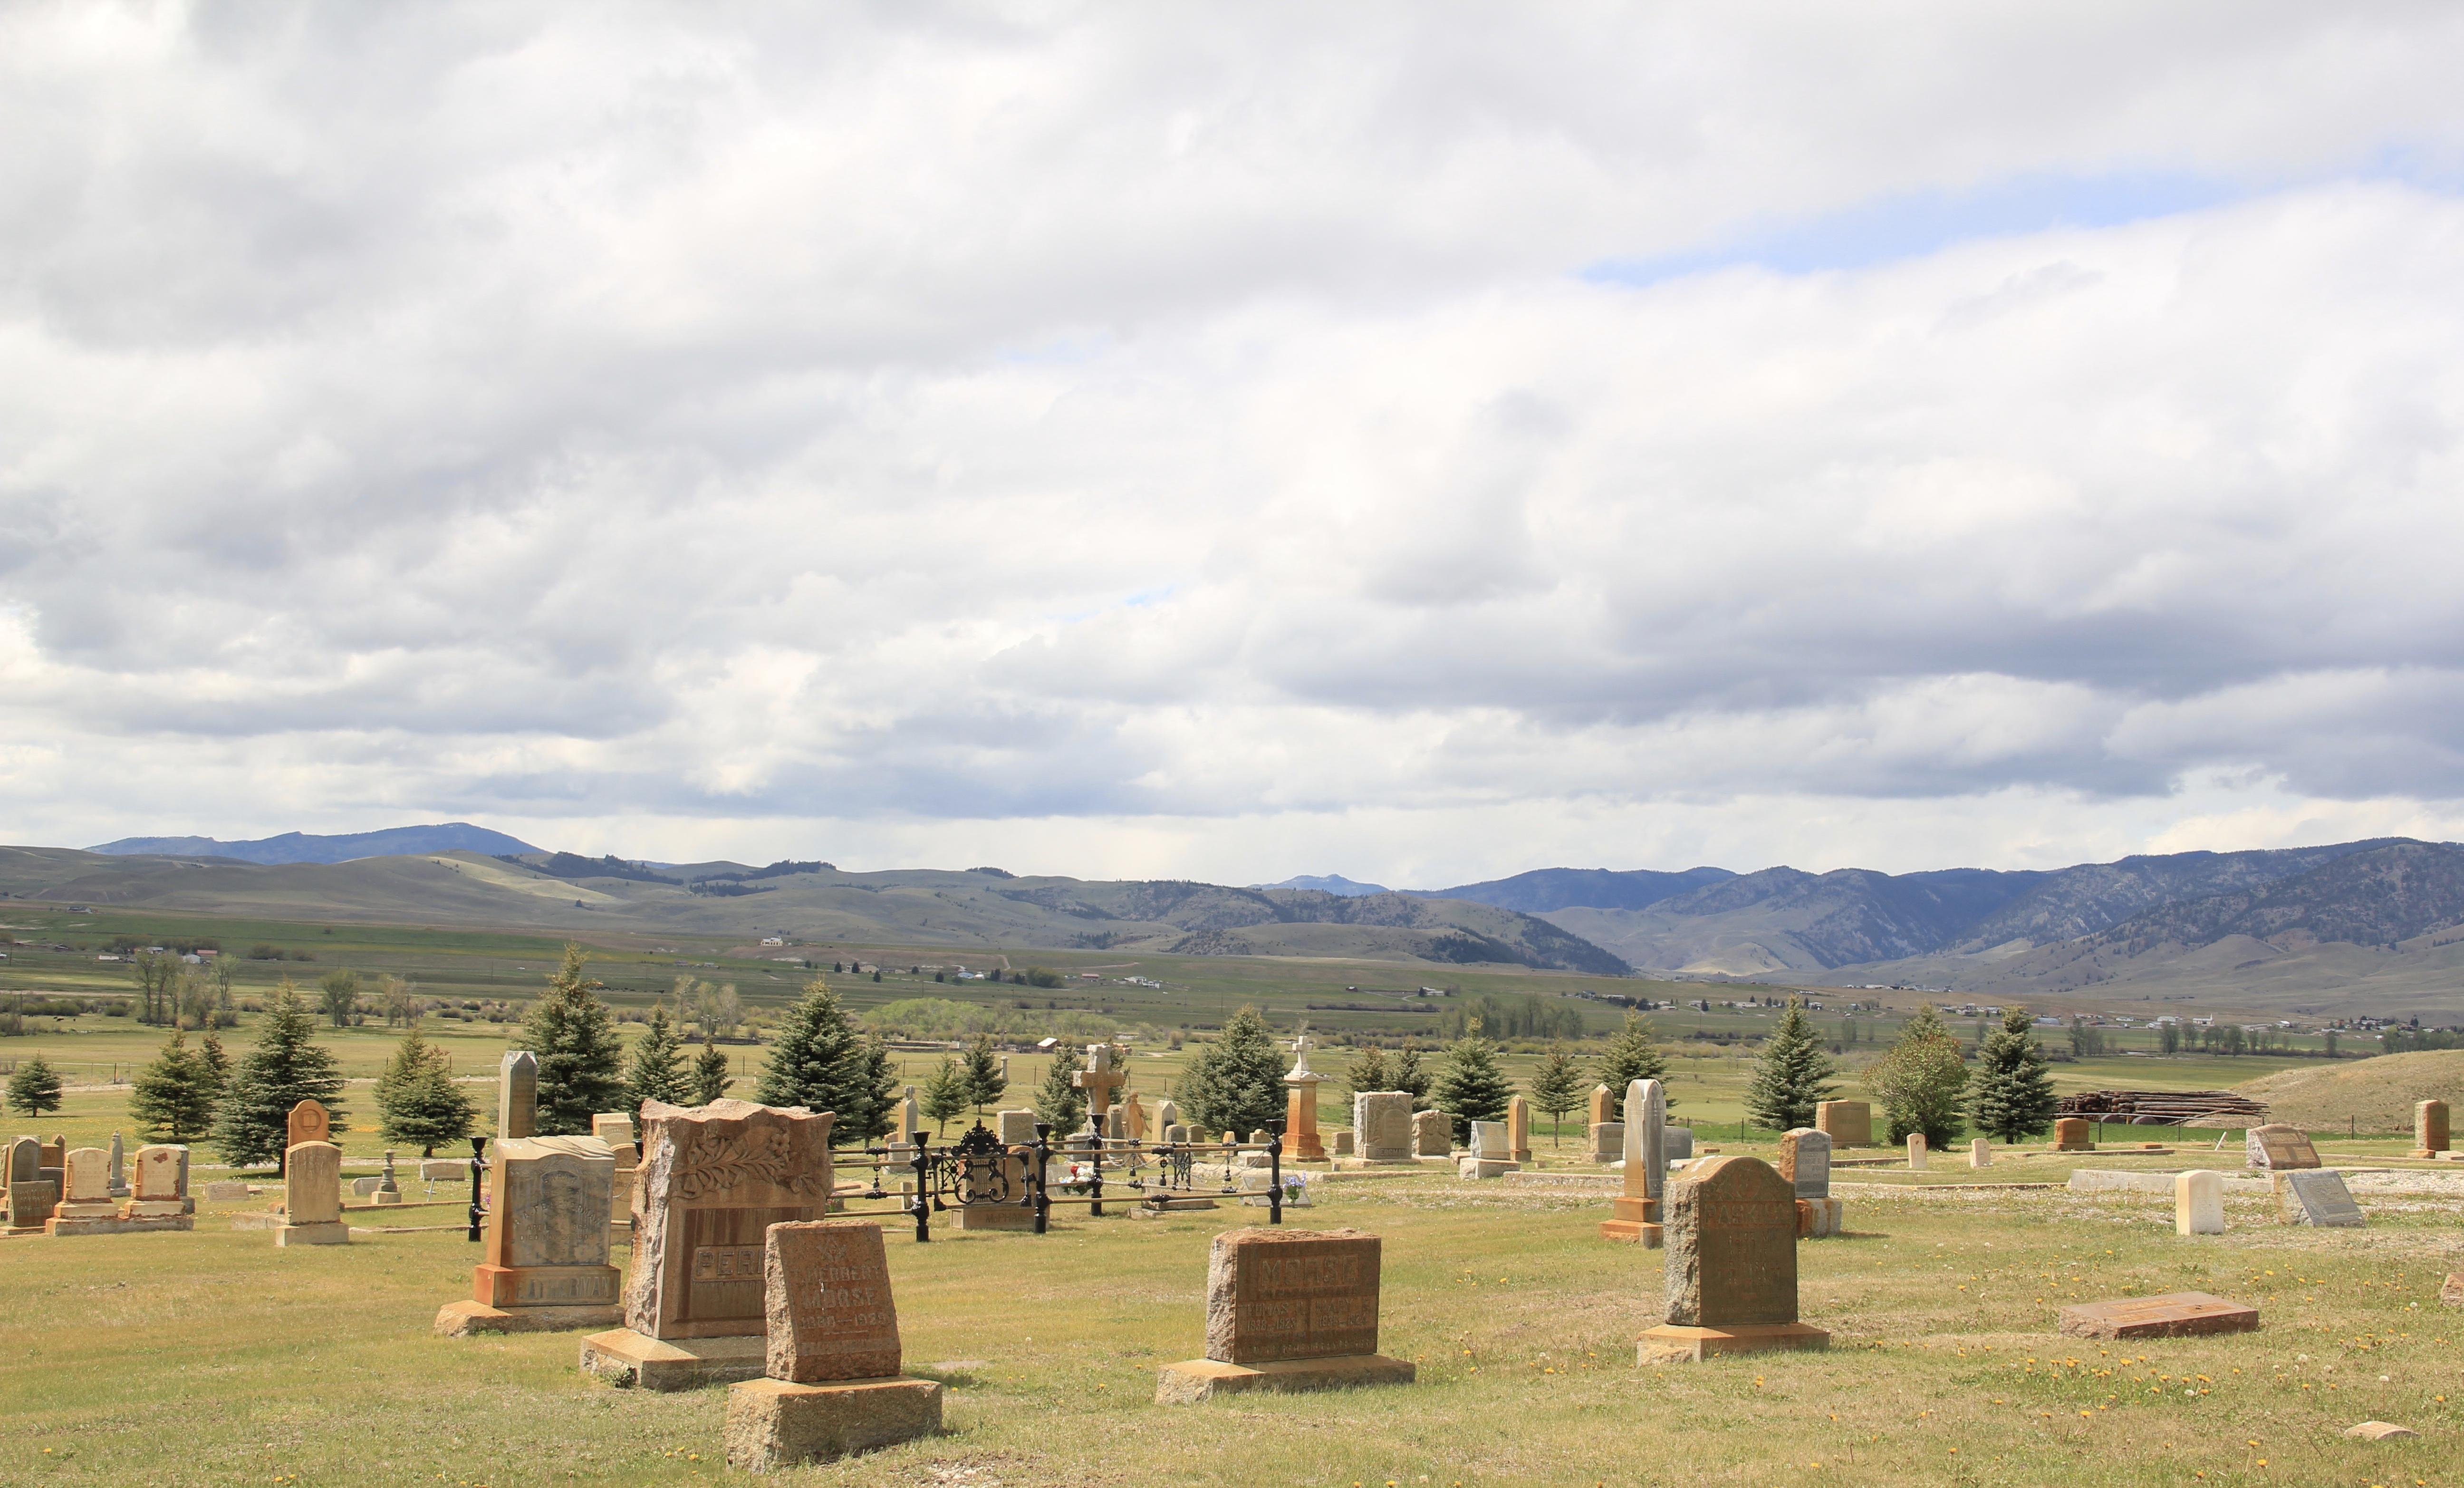 Valley Cemetery, Mullan Road, Granite Co 2